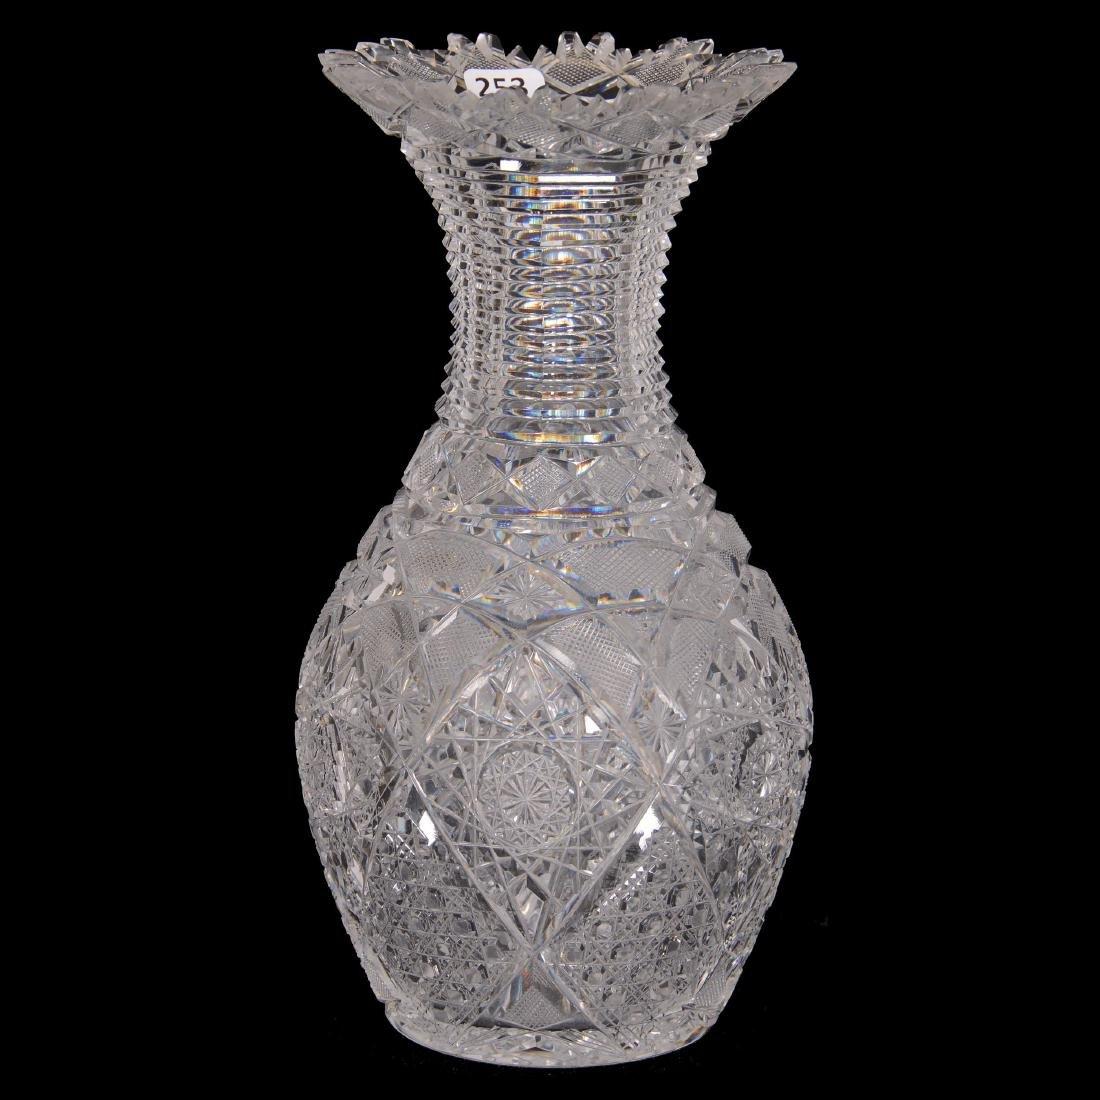 American Brilliant Cut Glass Bowling Pin Vase